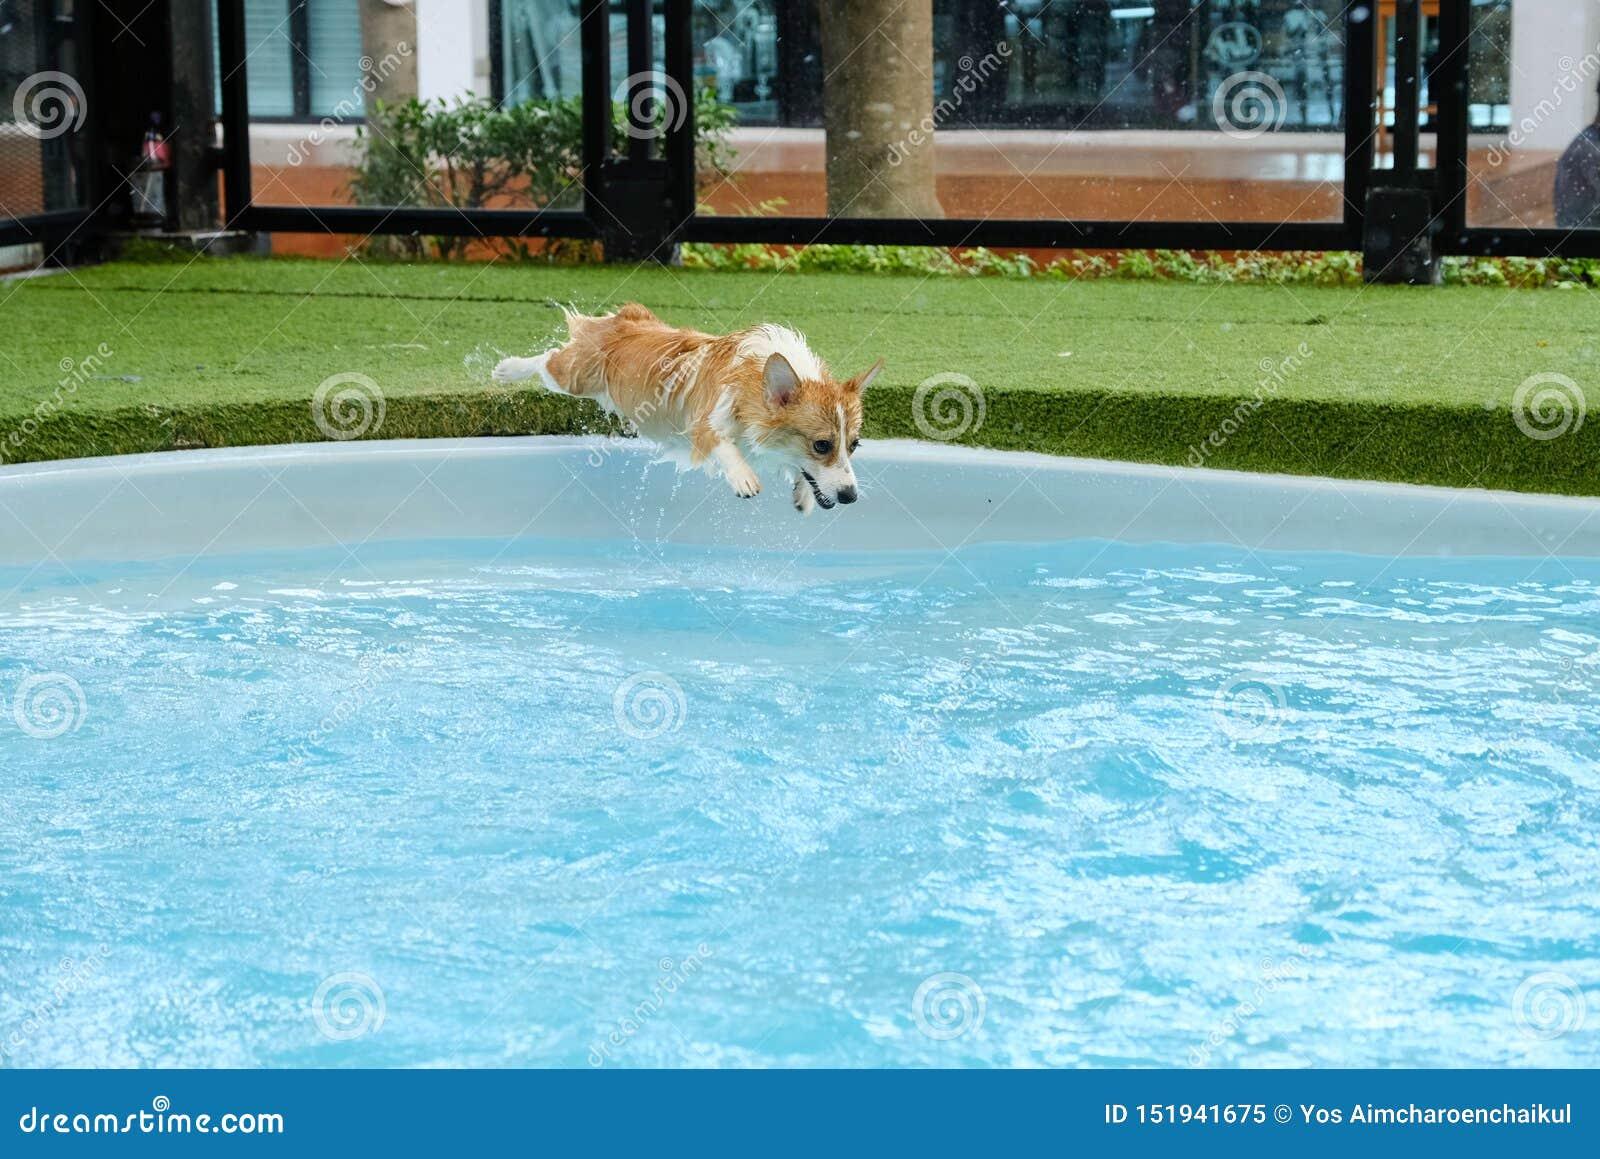 Éxito del perro del corgi Galés para superar el miedo del salto en piscina el fin de semana del verano Los perritos del Corgi son